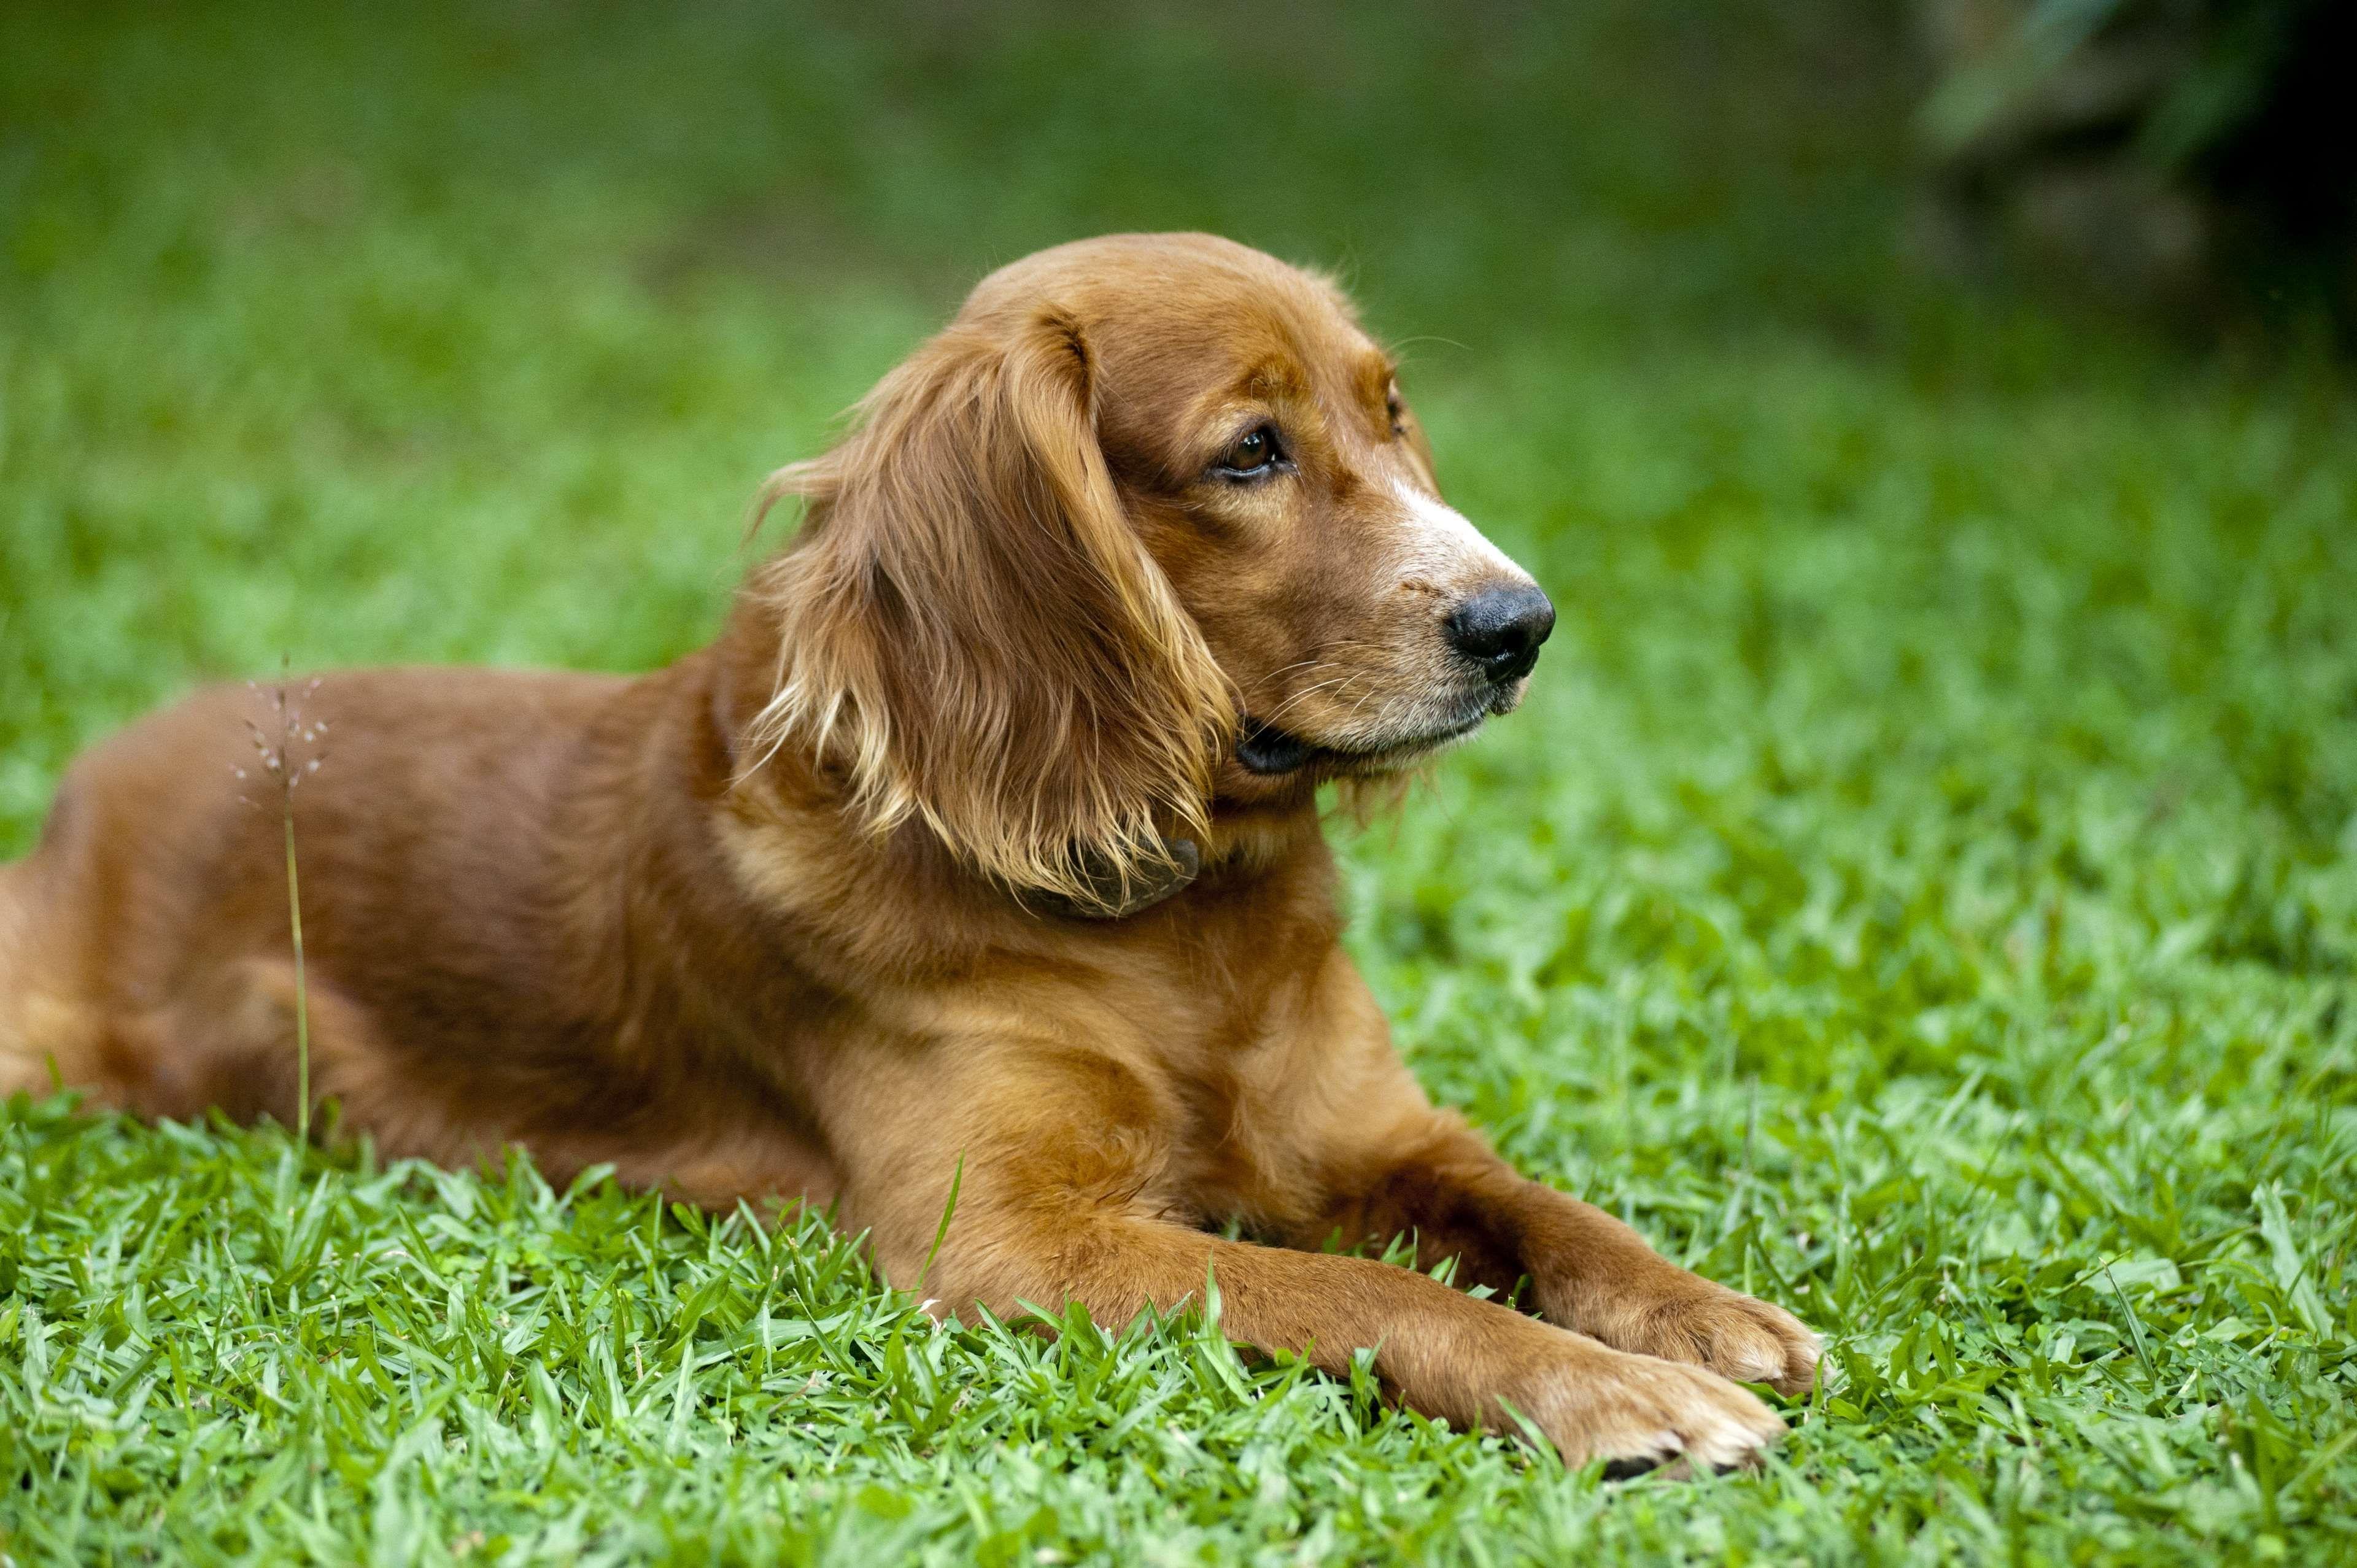 Beautiful Fur Brown Adorable Dog - 10673d1f65c97b8fa00f4be7f9a99aa2  Image_311310  .jpg